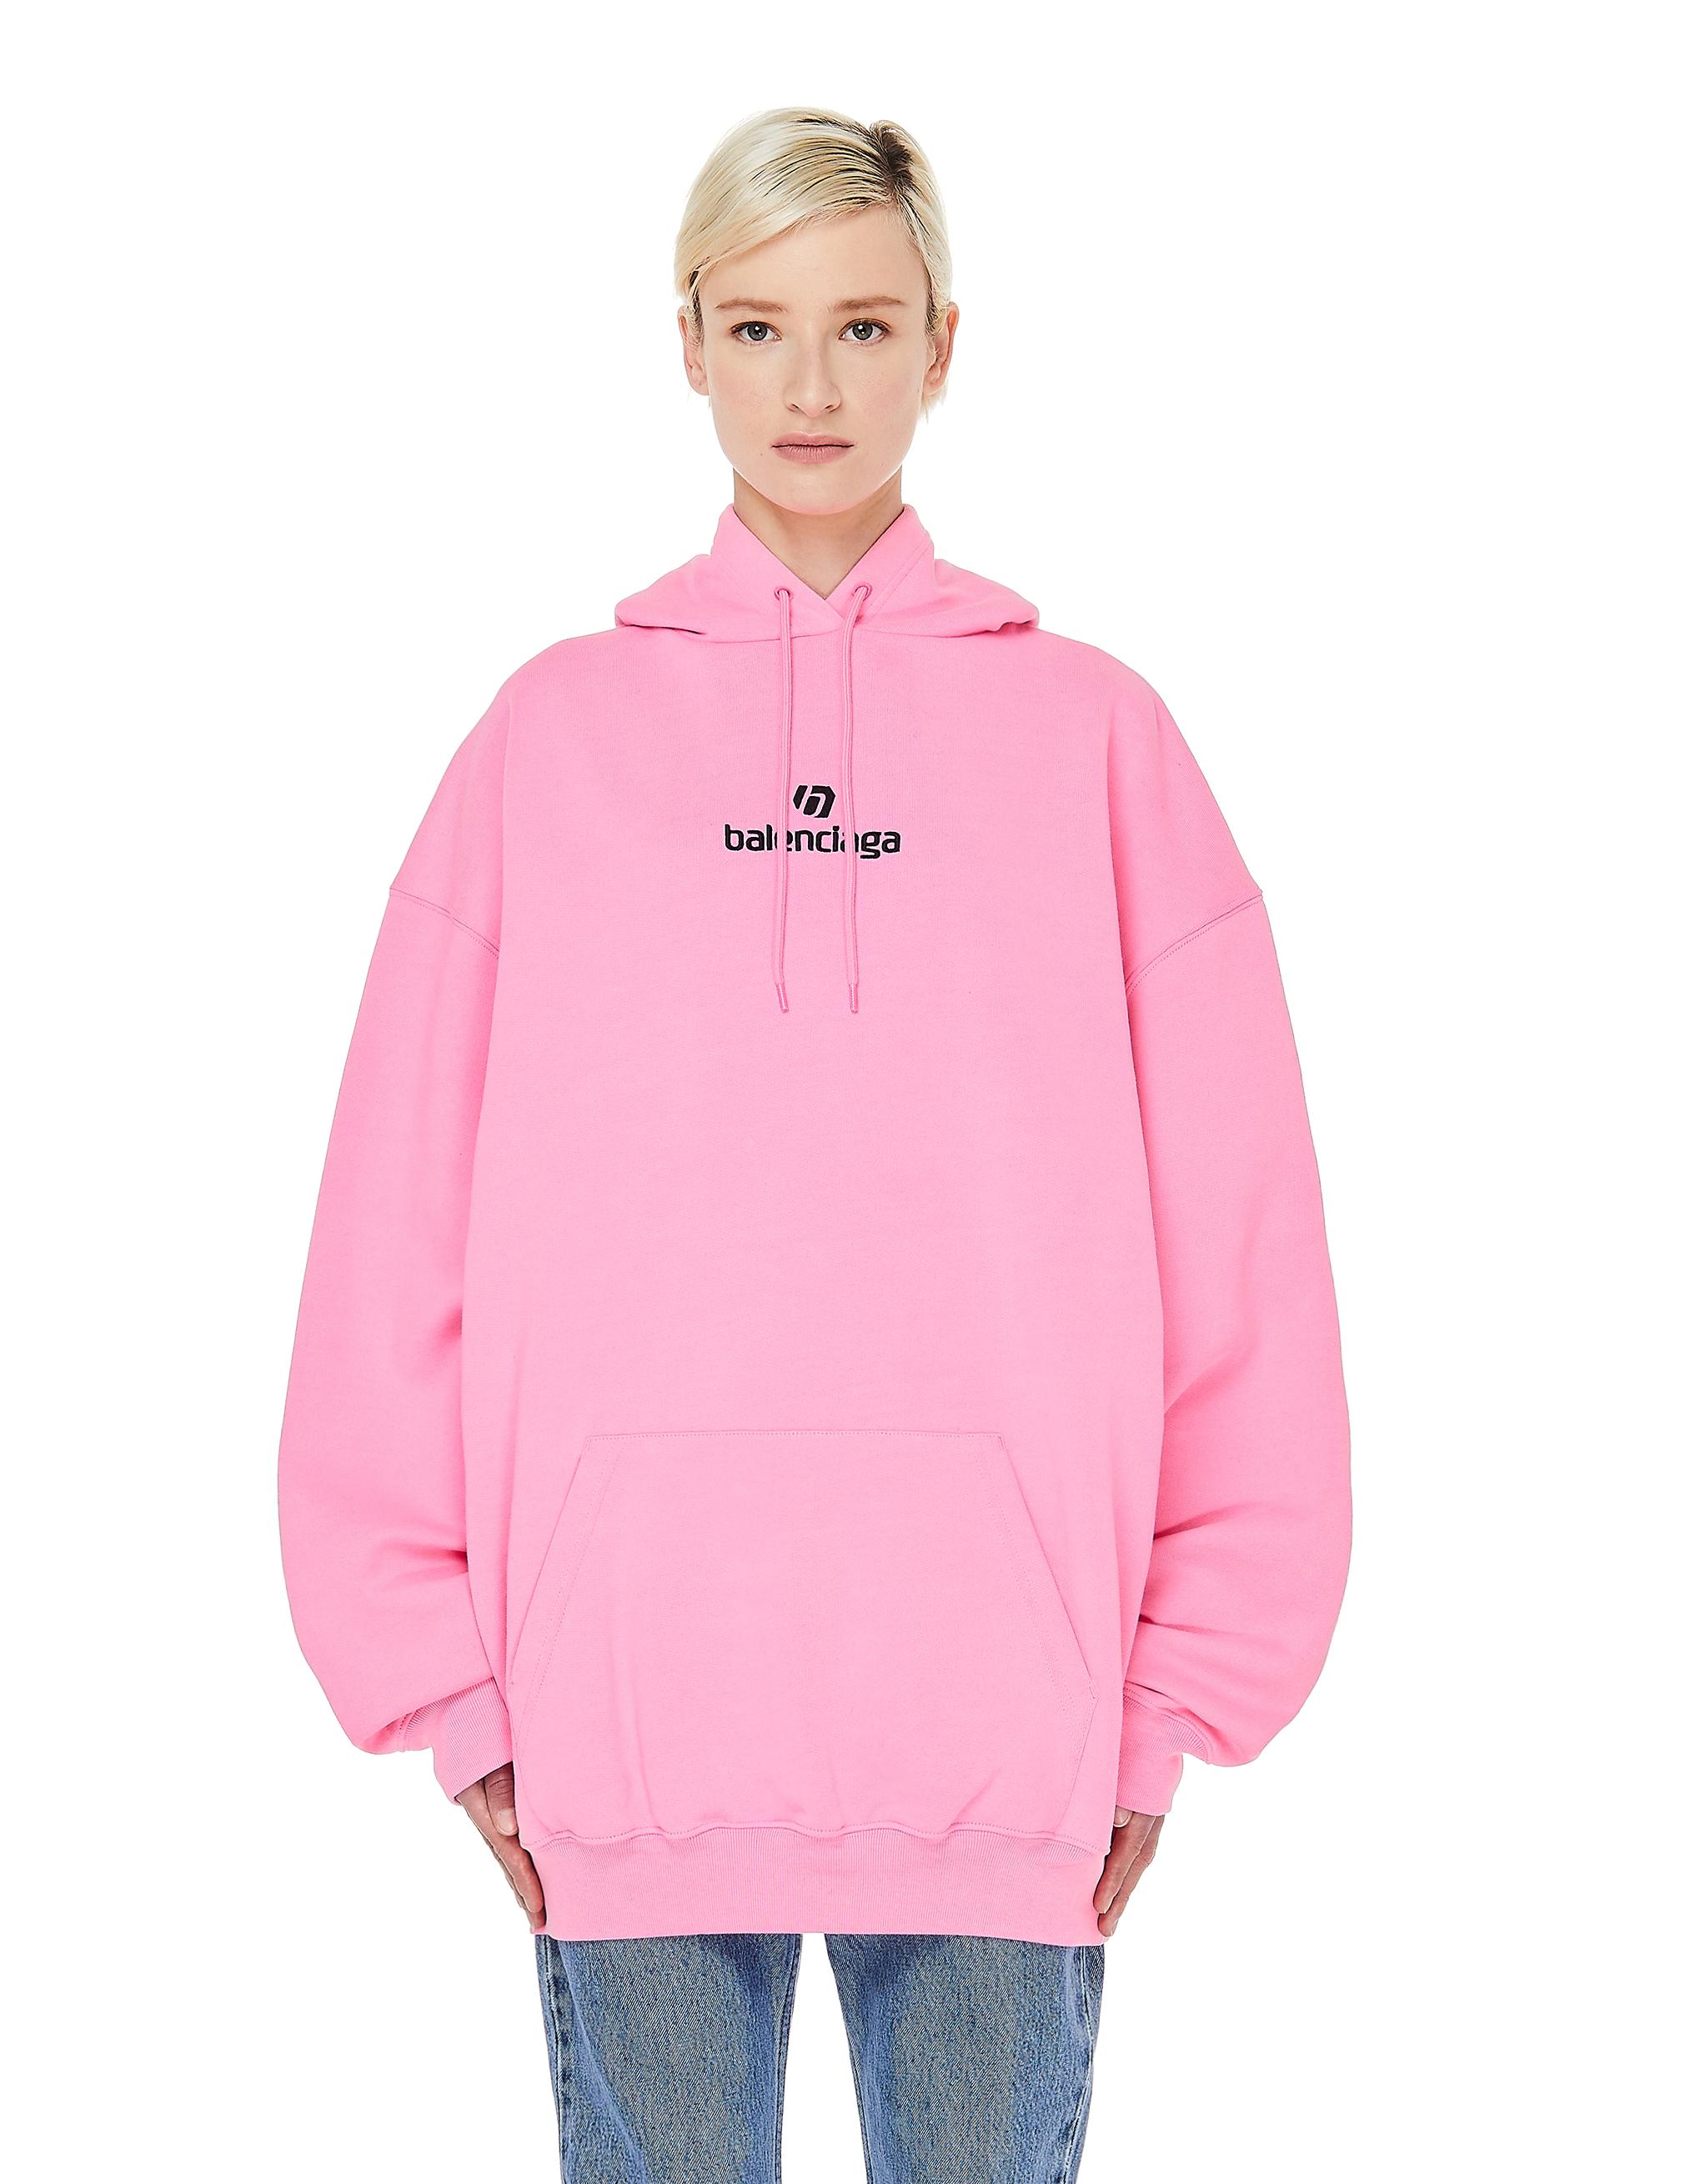 Balenciaga Pink Logo Printed Hoodie